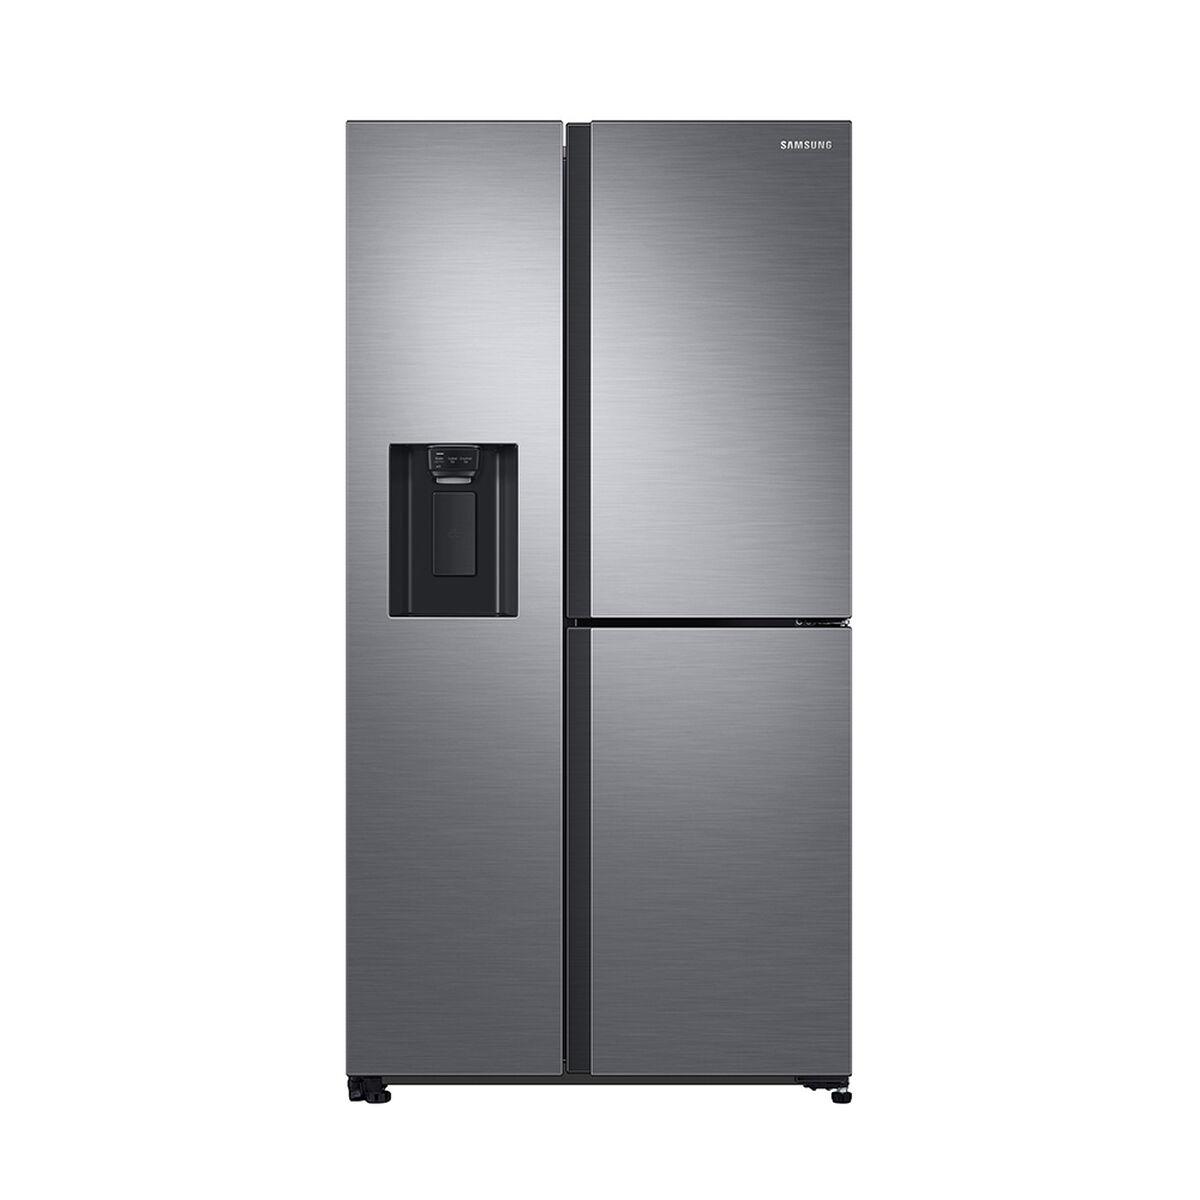 Refrigerador Side by Side Samsung RS65R5691M9/ZS 602 lt